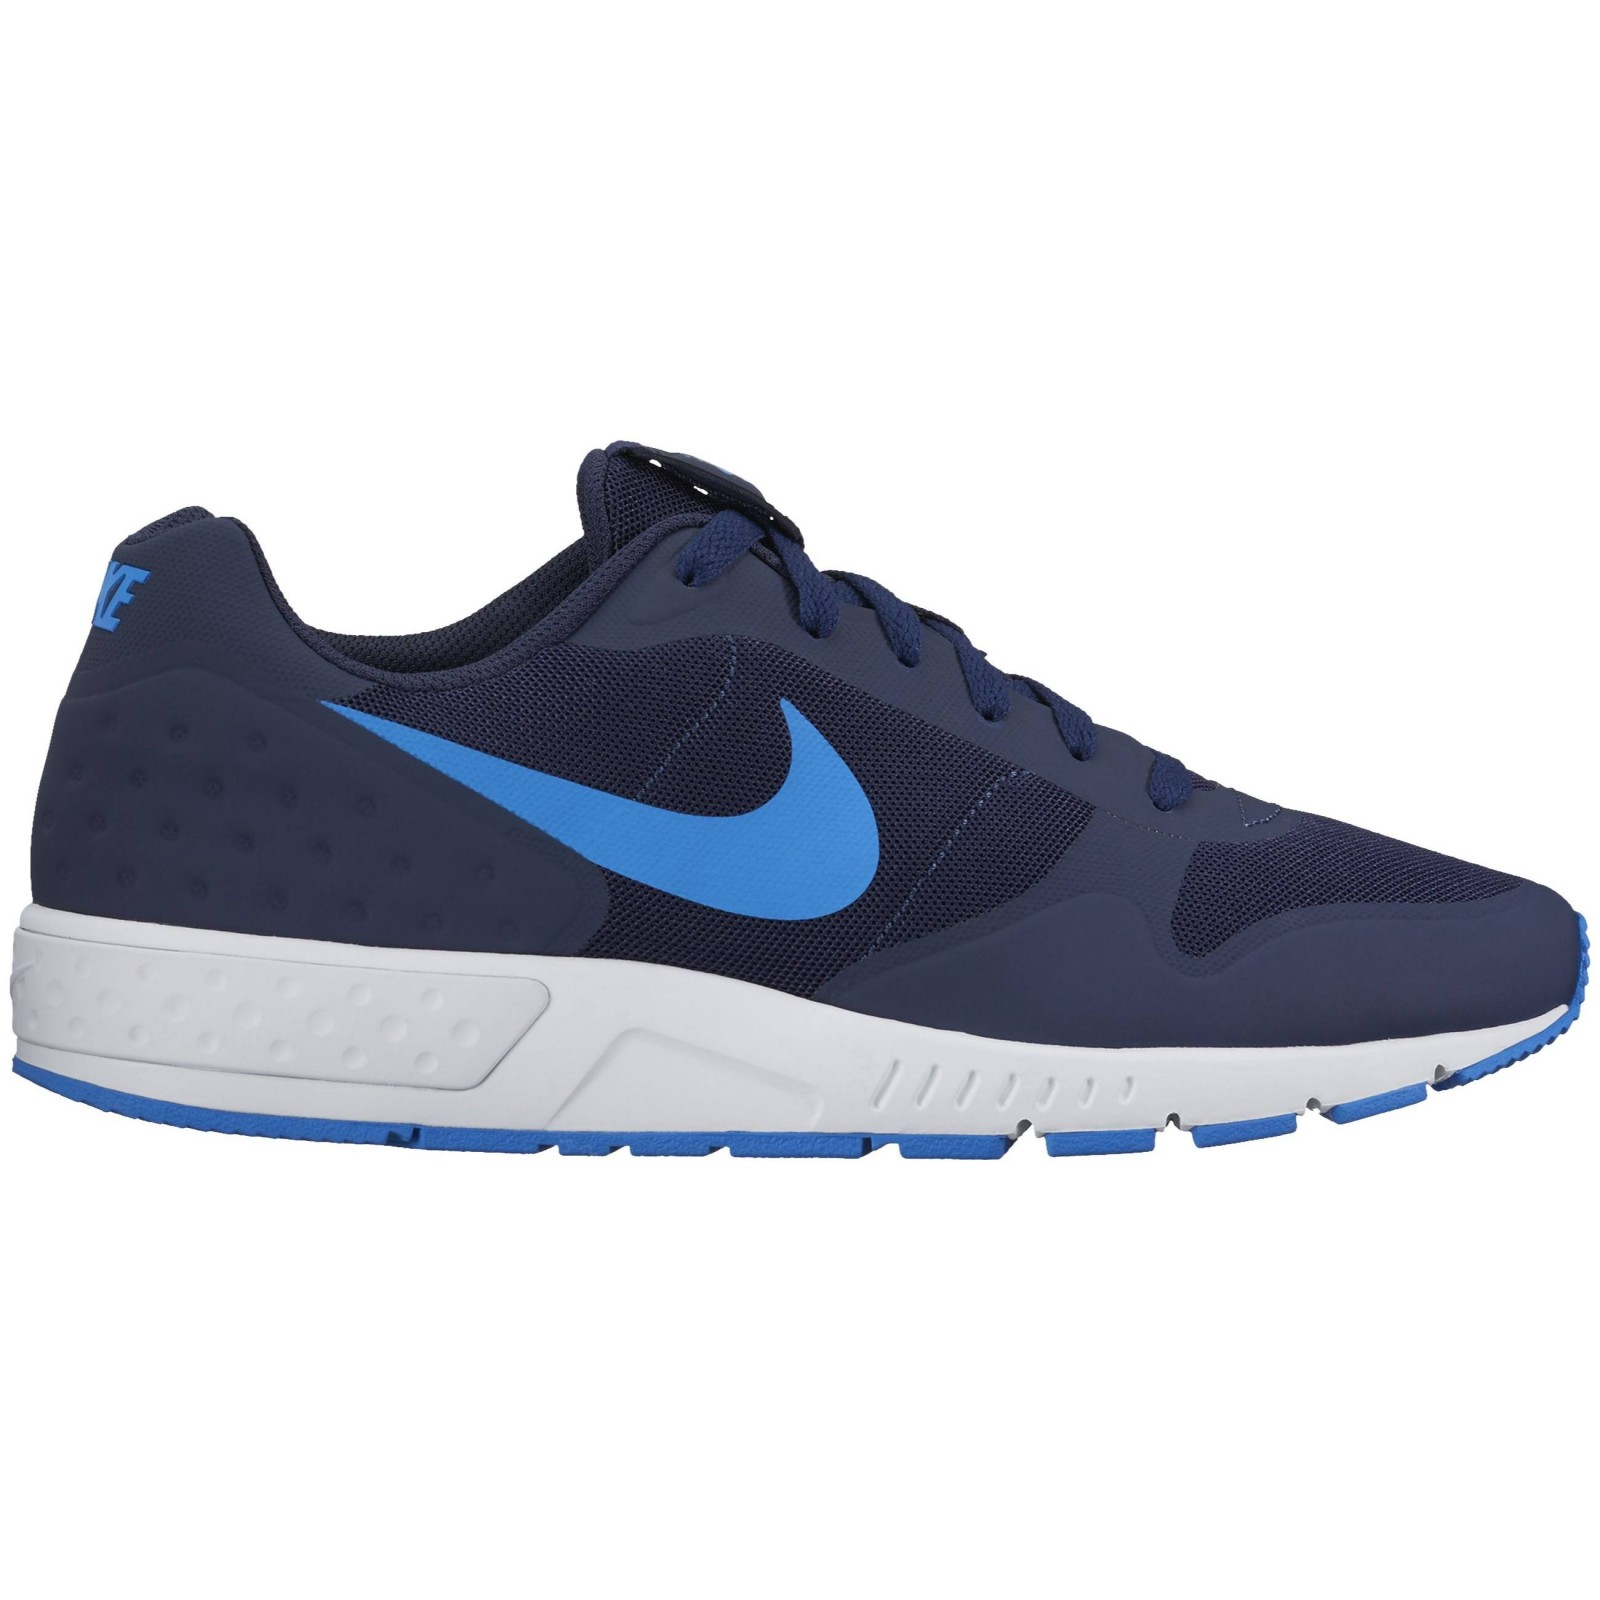 Pánské tenisky Nike NIGHTGAZER LW SE c378b35e767